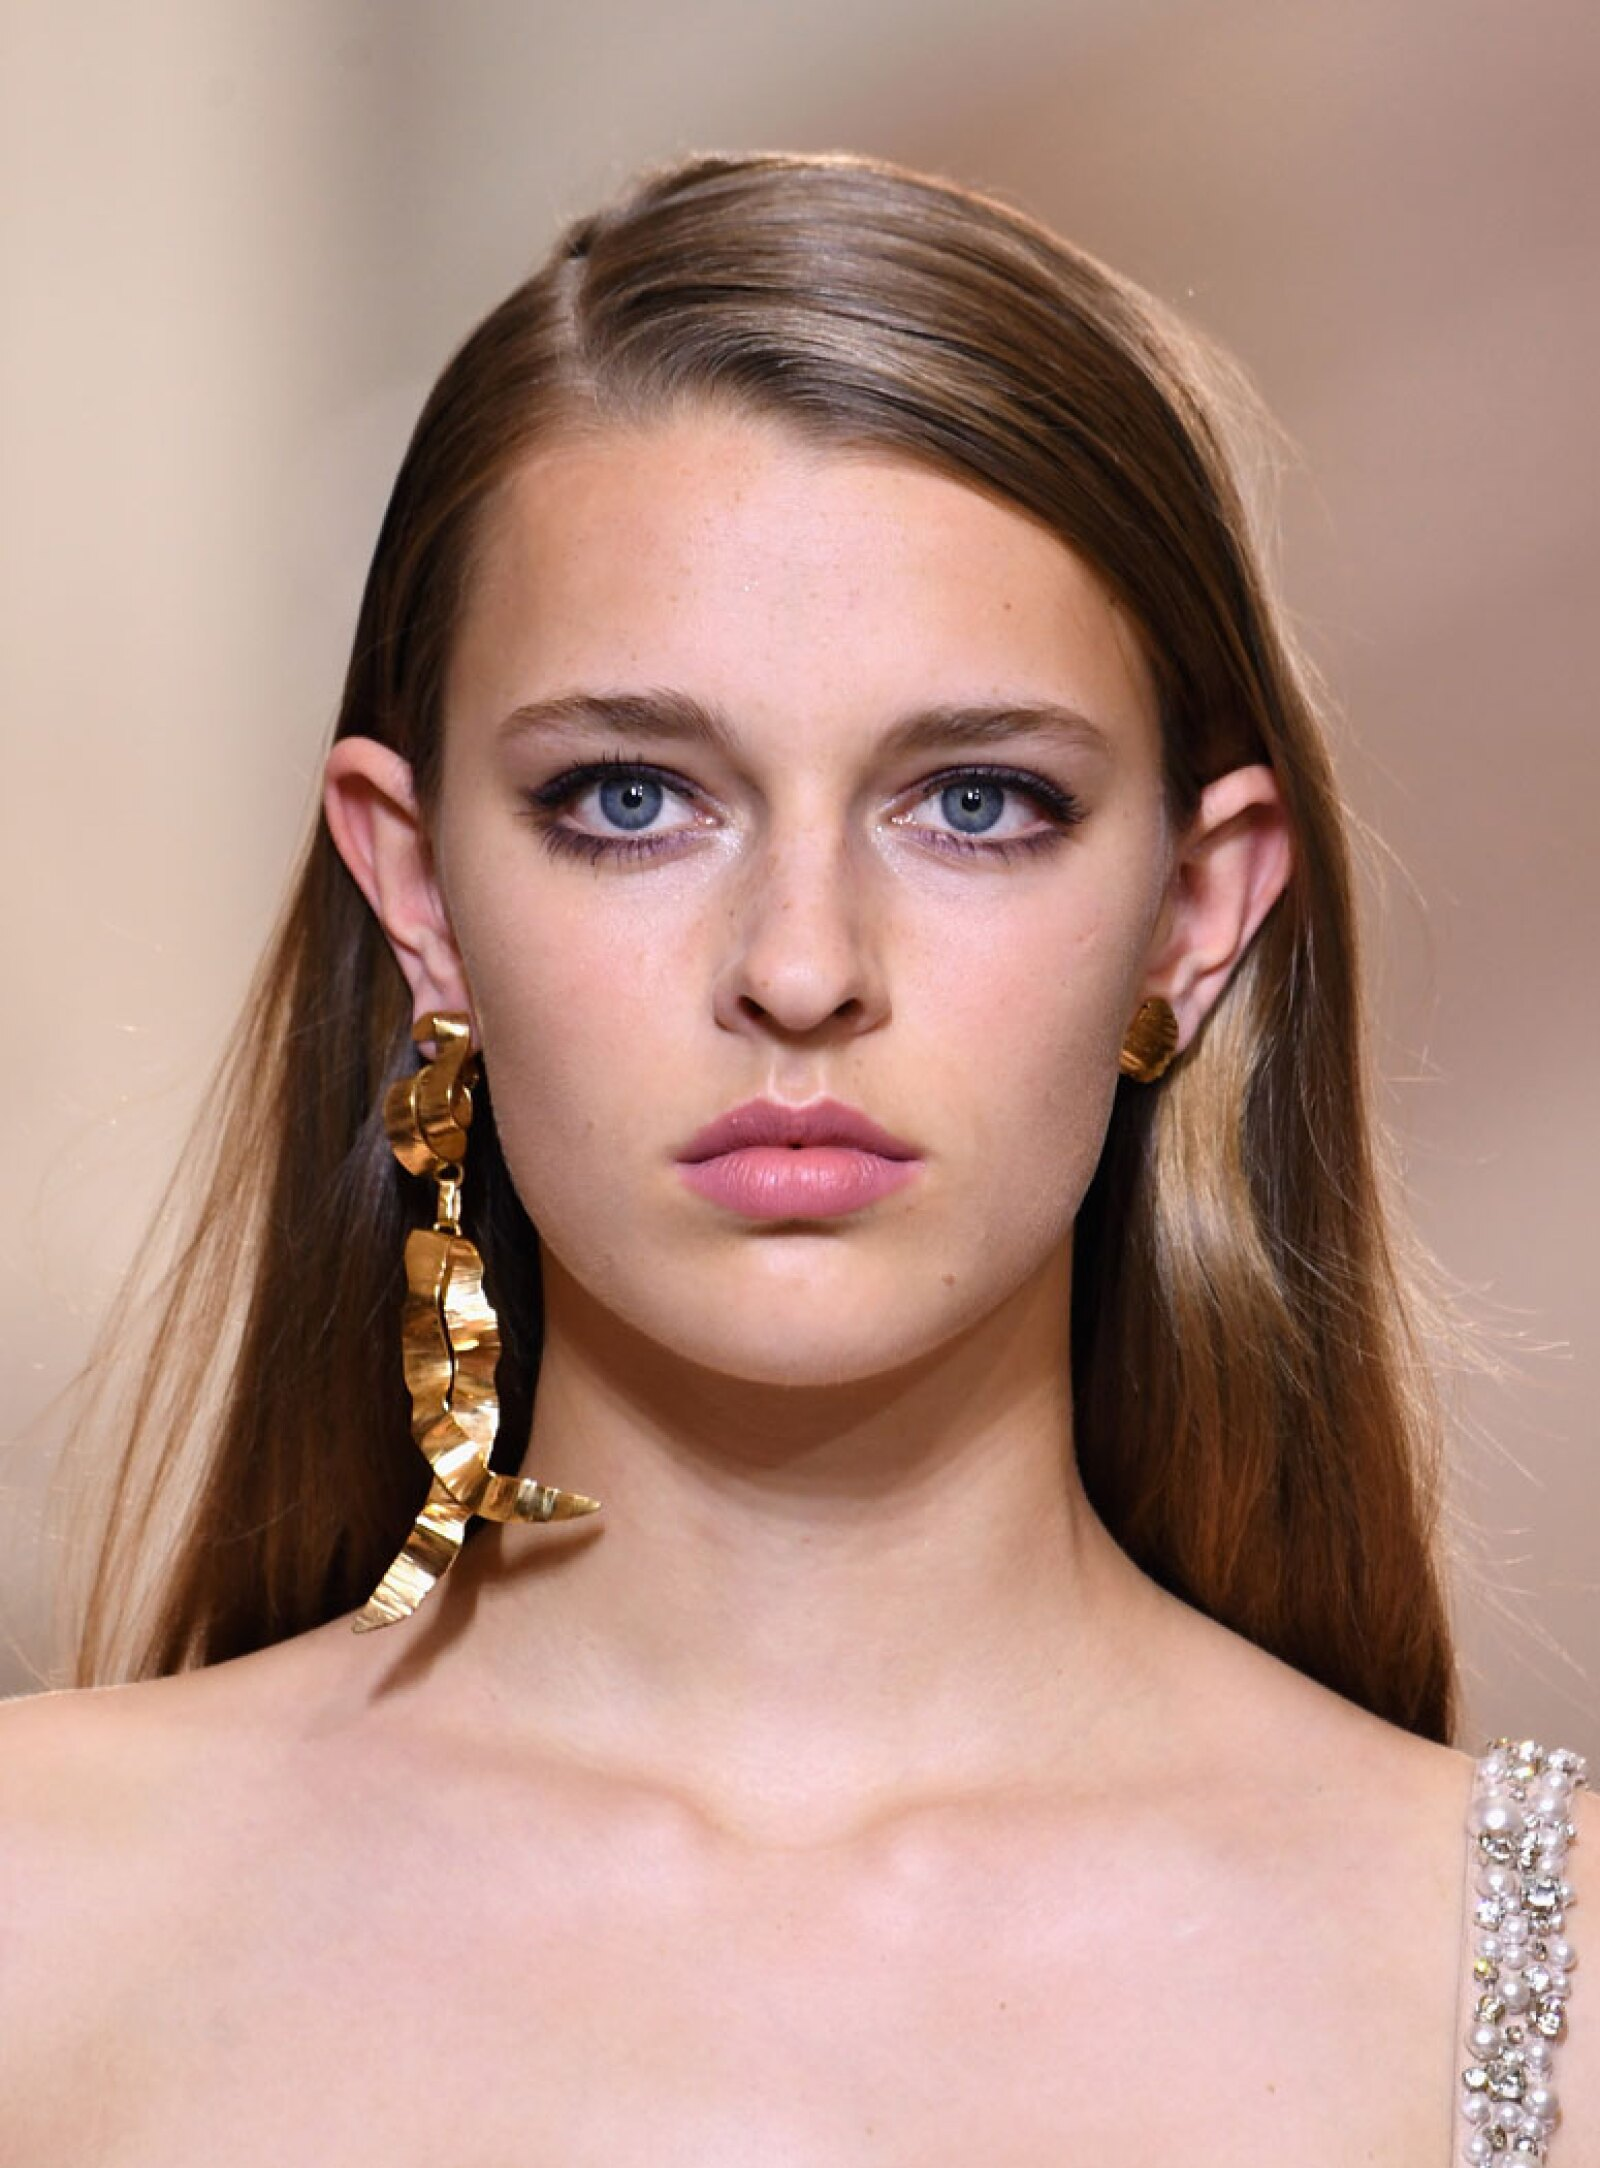 mejores-beauty-looks-haute-couture-5